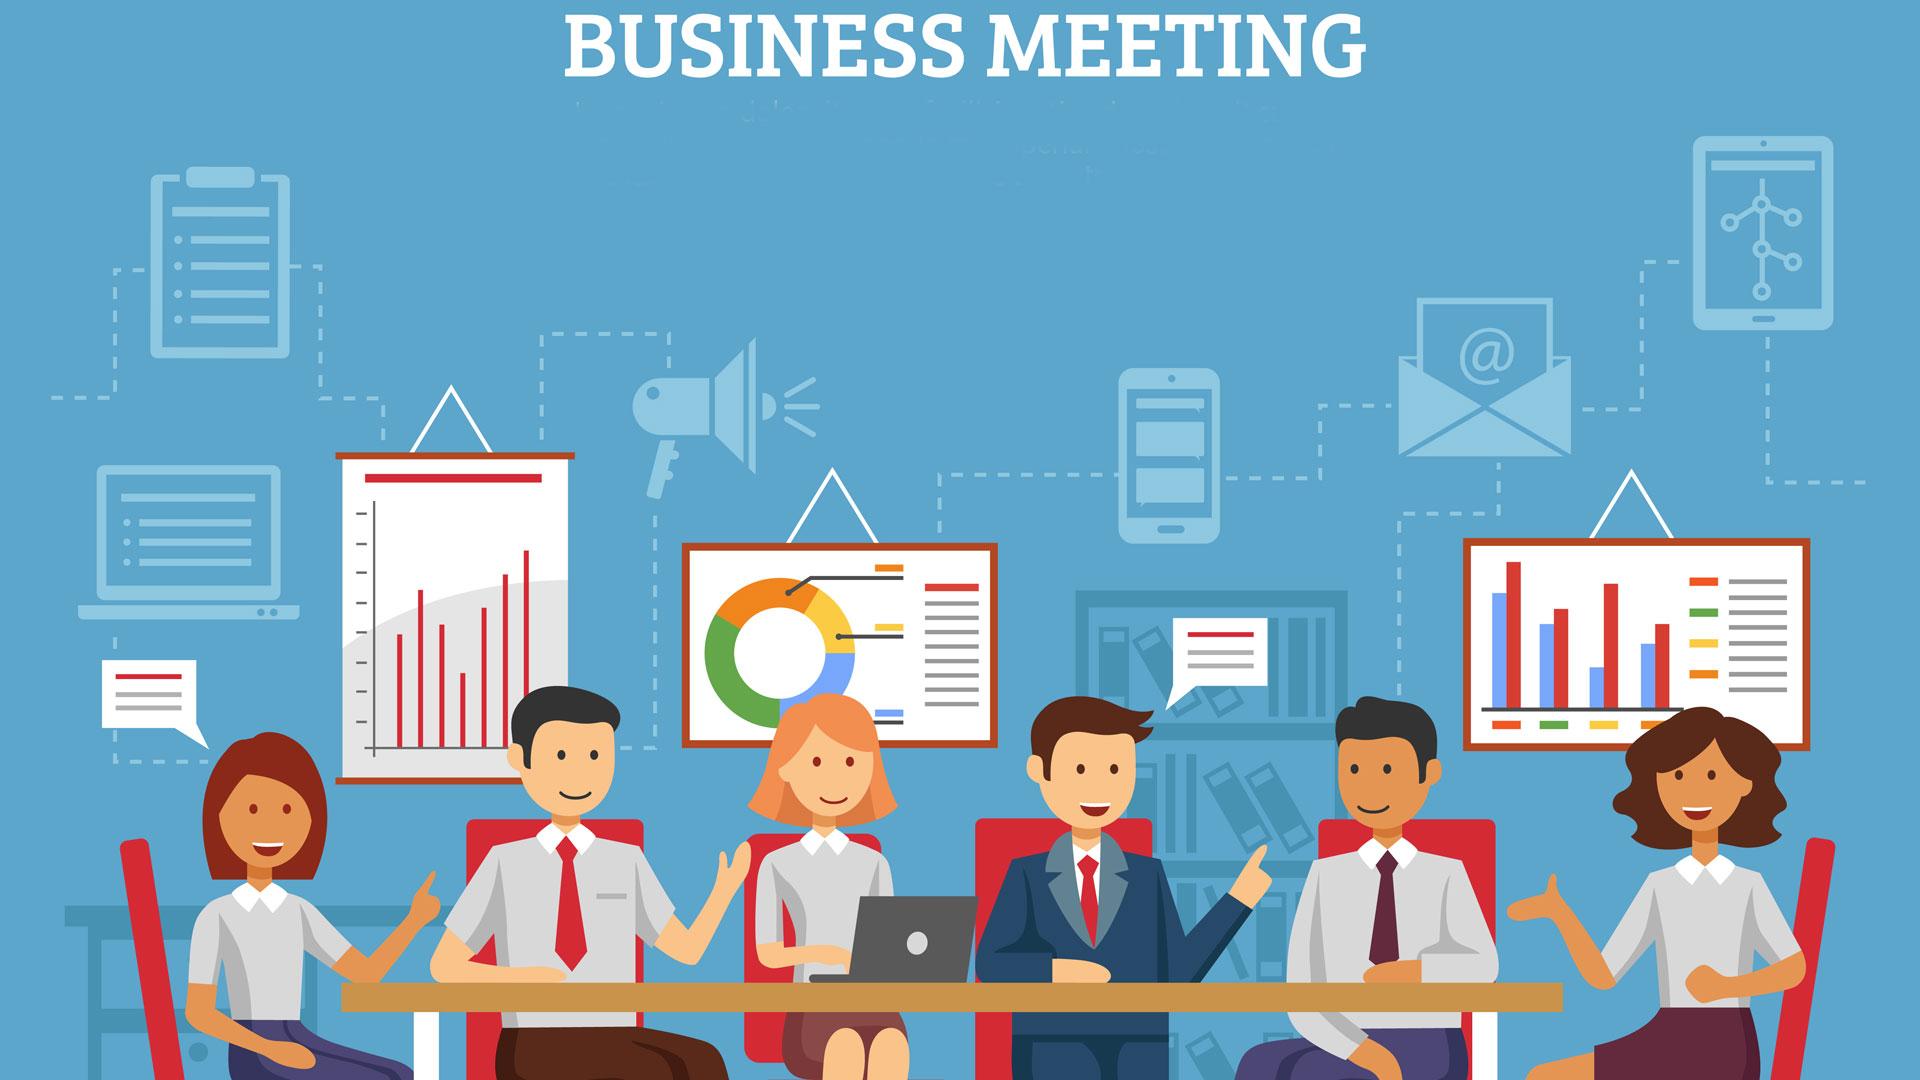 NORWEGIAN BUSINESS ASSOCIATION (INDIA) ANNUAL GENERAL MEETING 2018-19